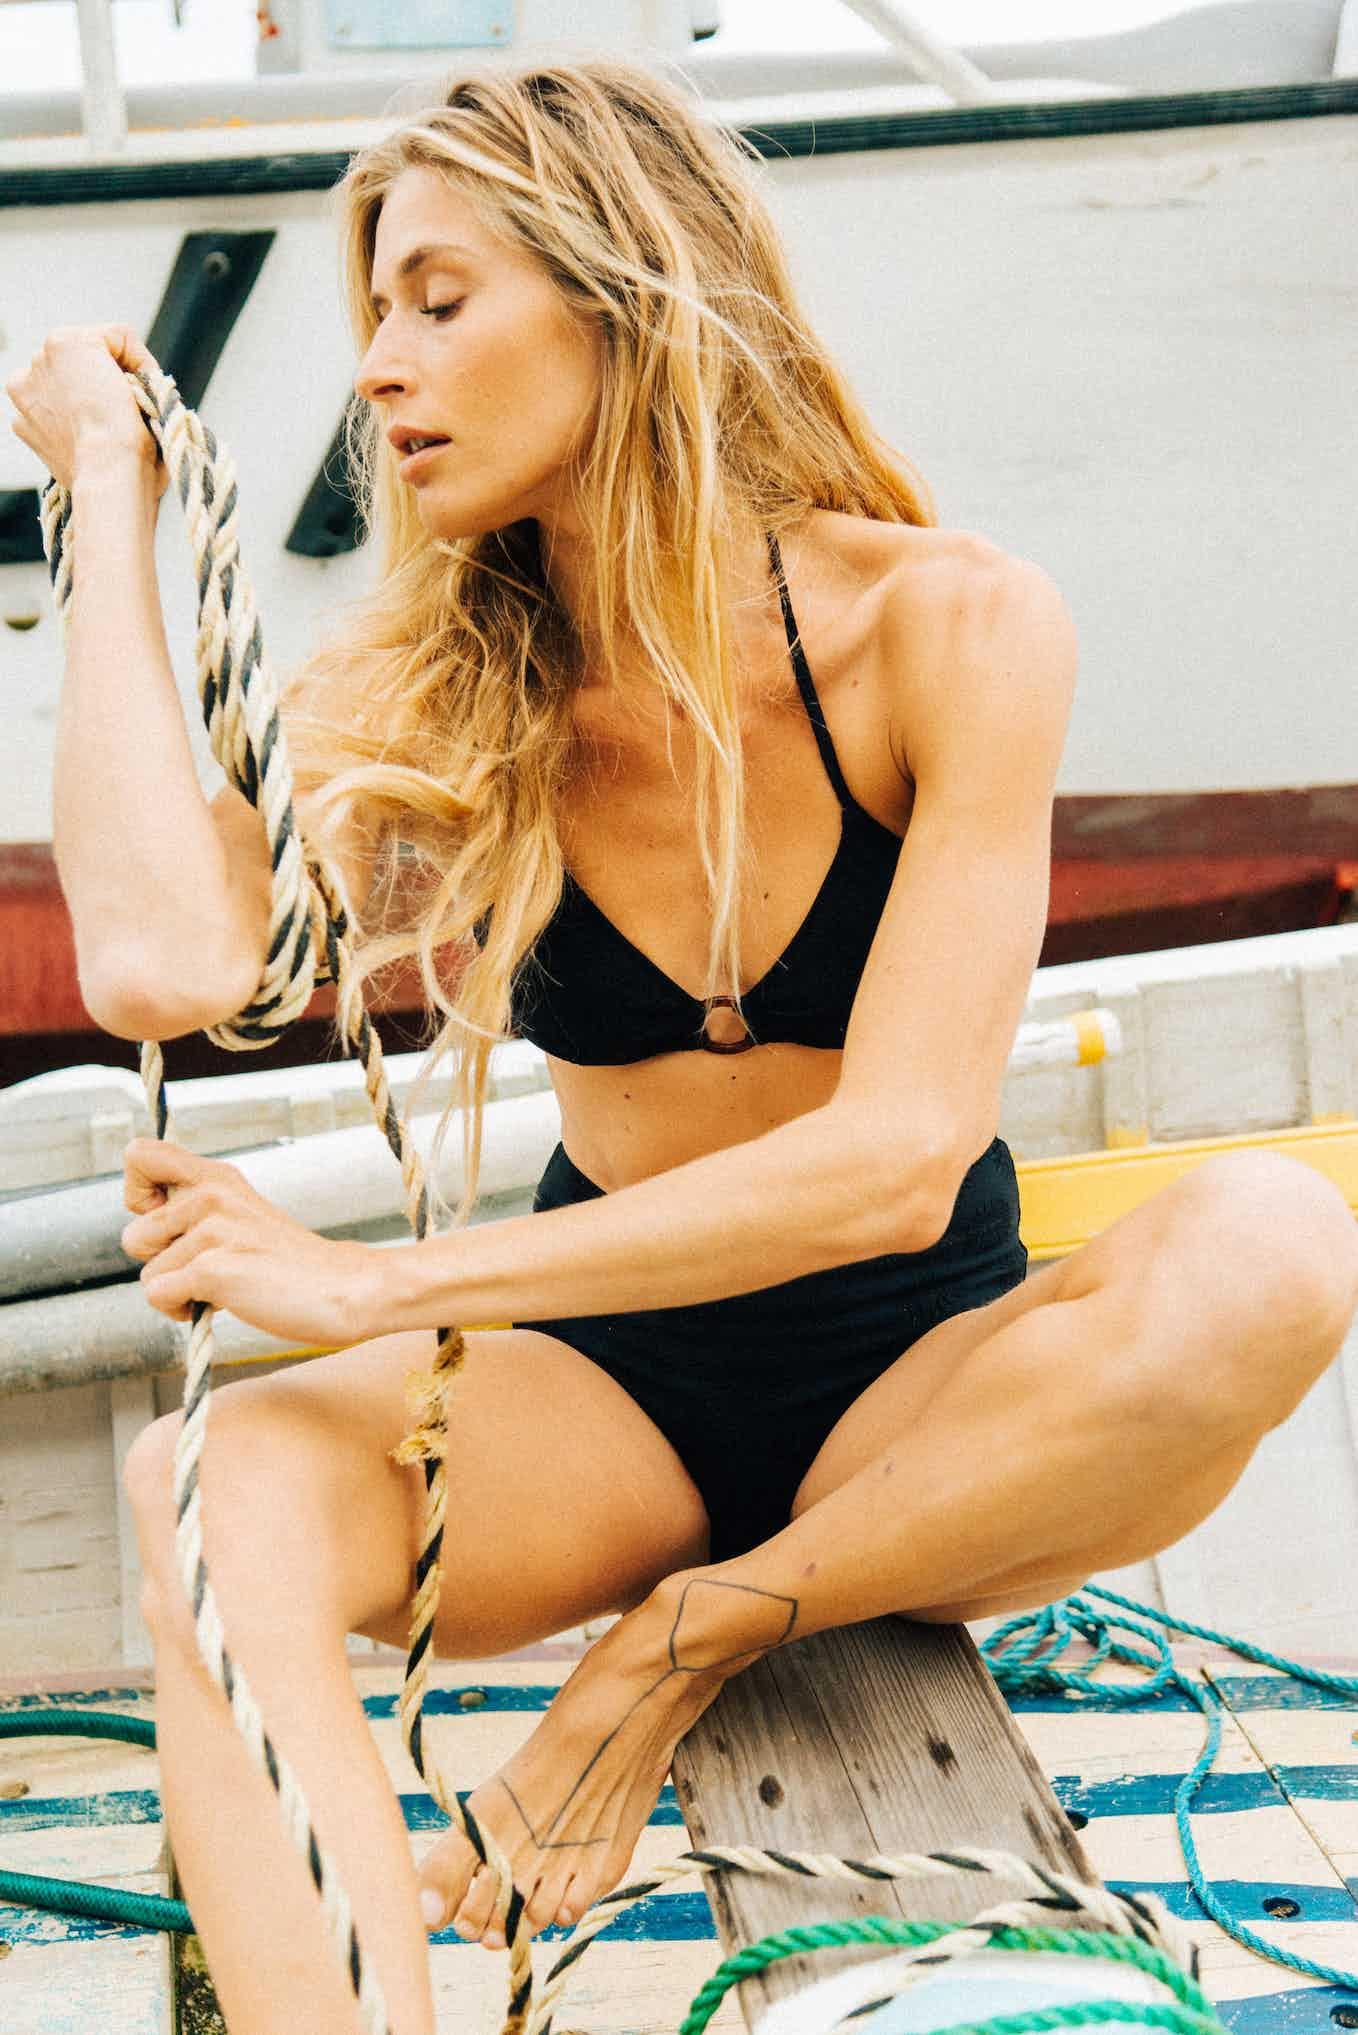 Bikini Horizons doux in black